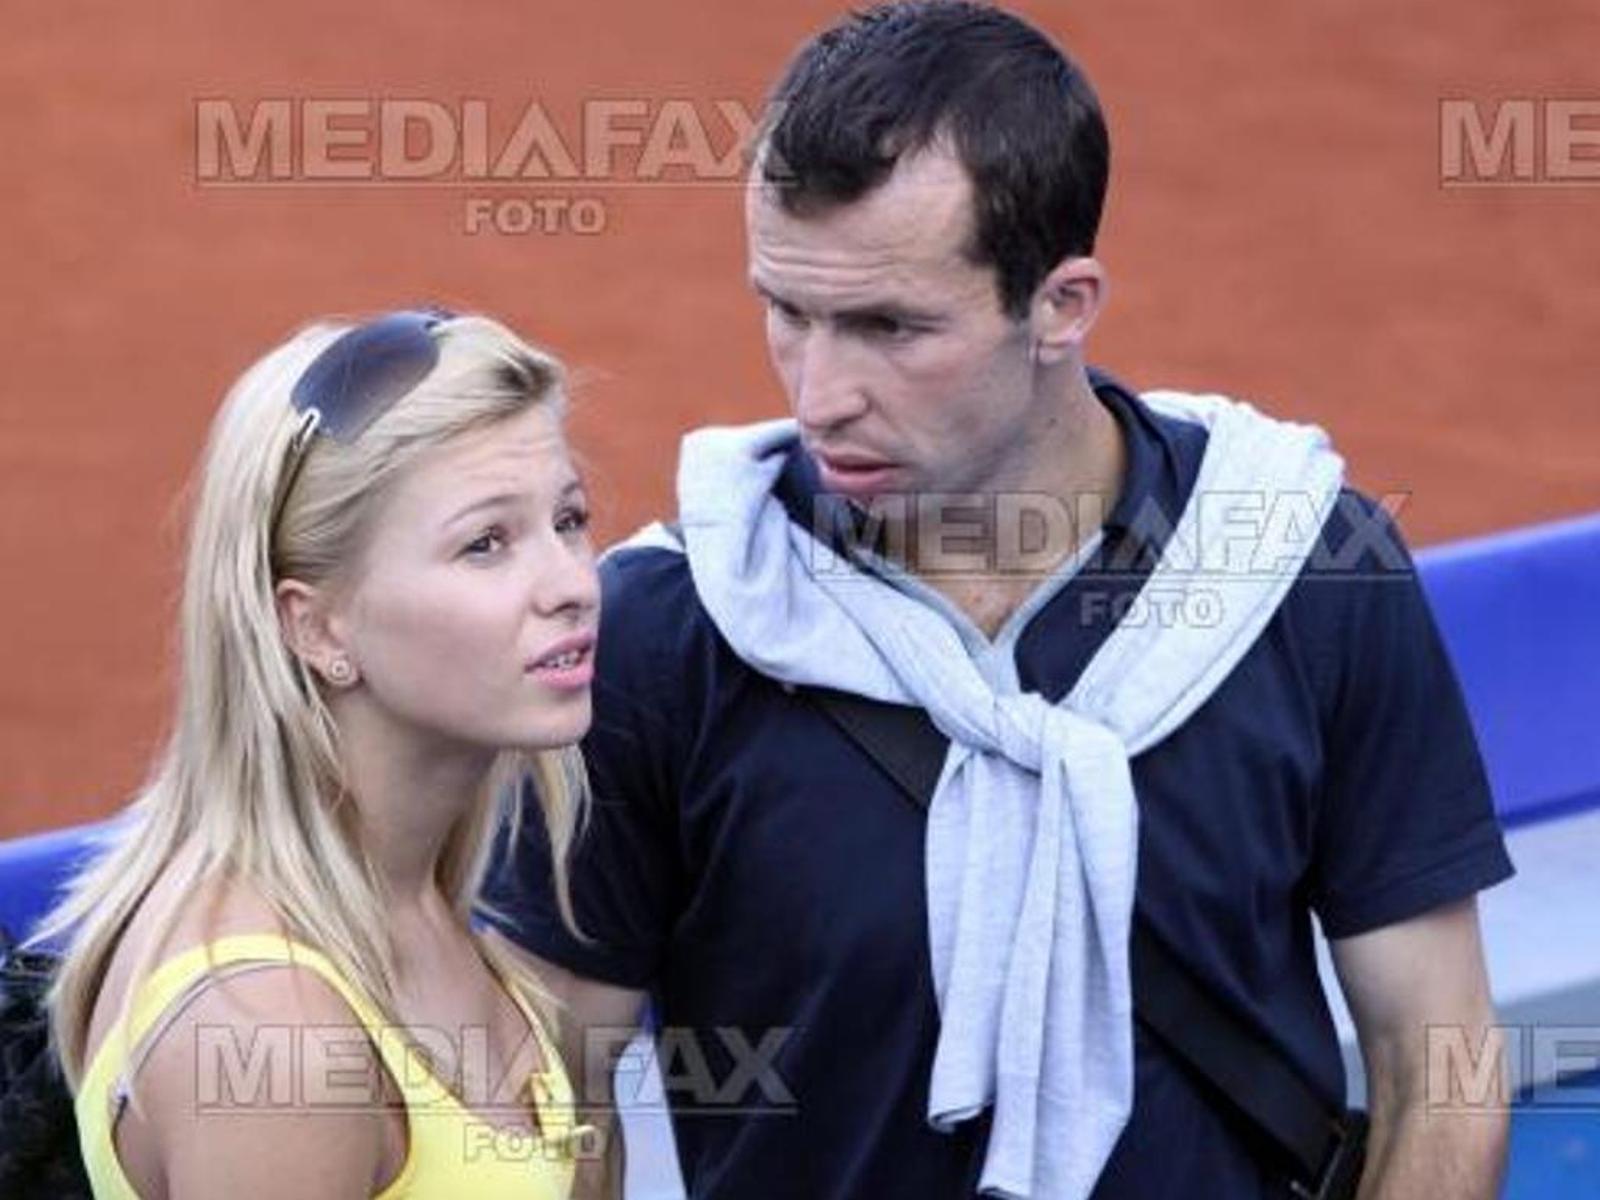 Radek Stepanek kiss with Inna Puhajkova (Jagr girlfriend)